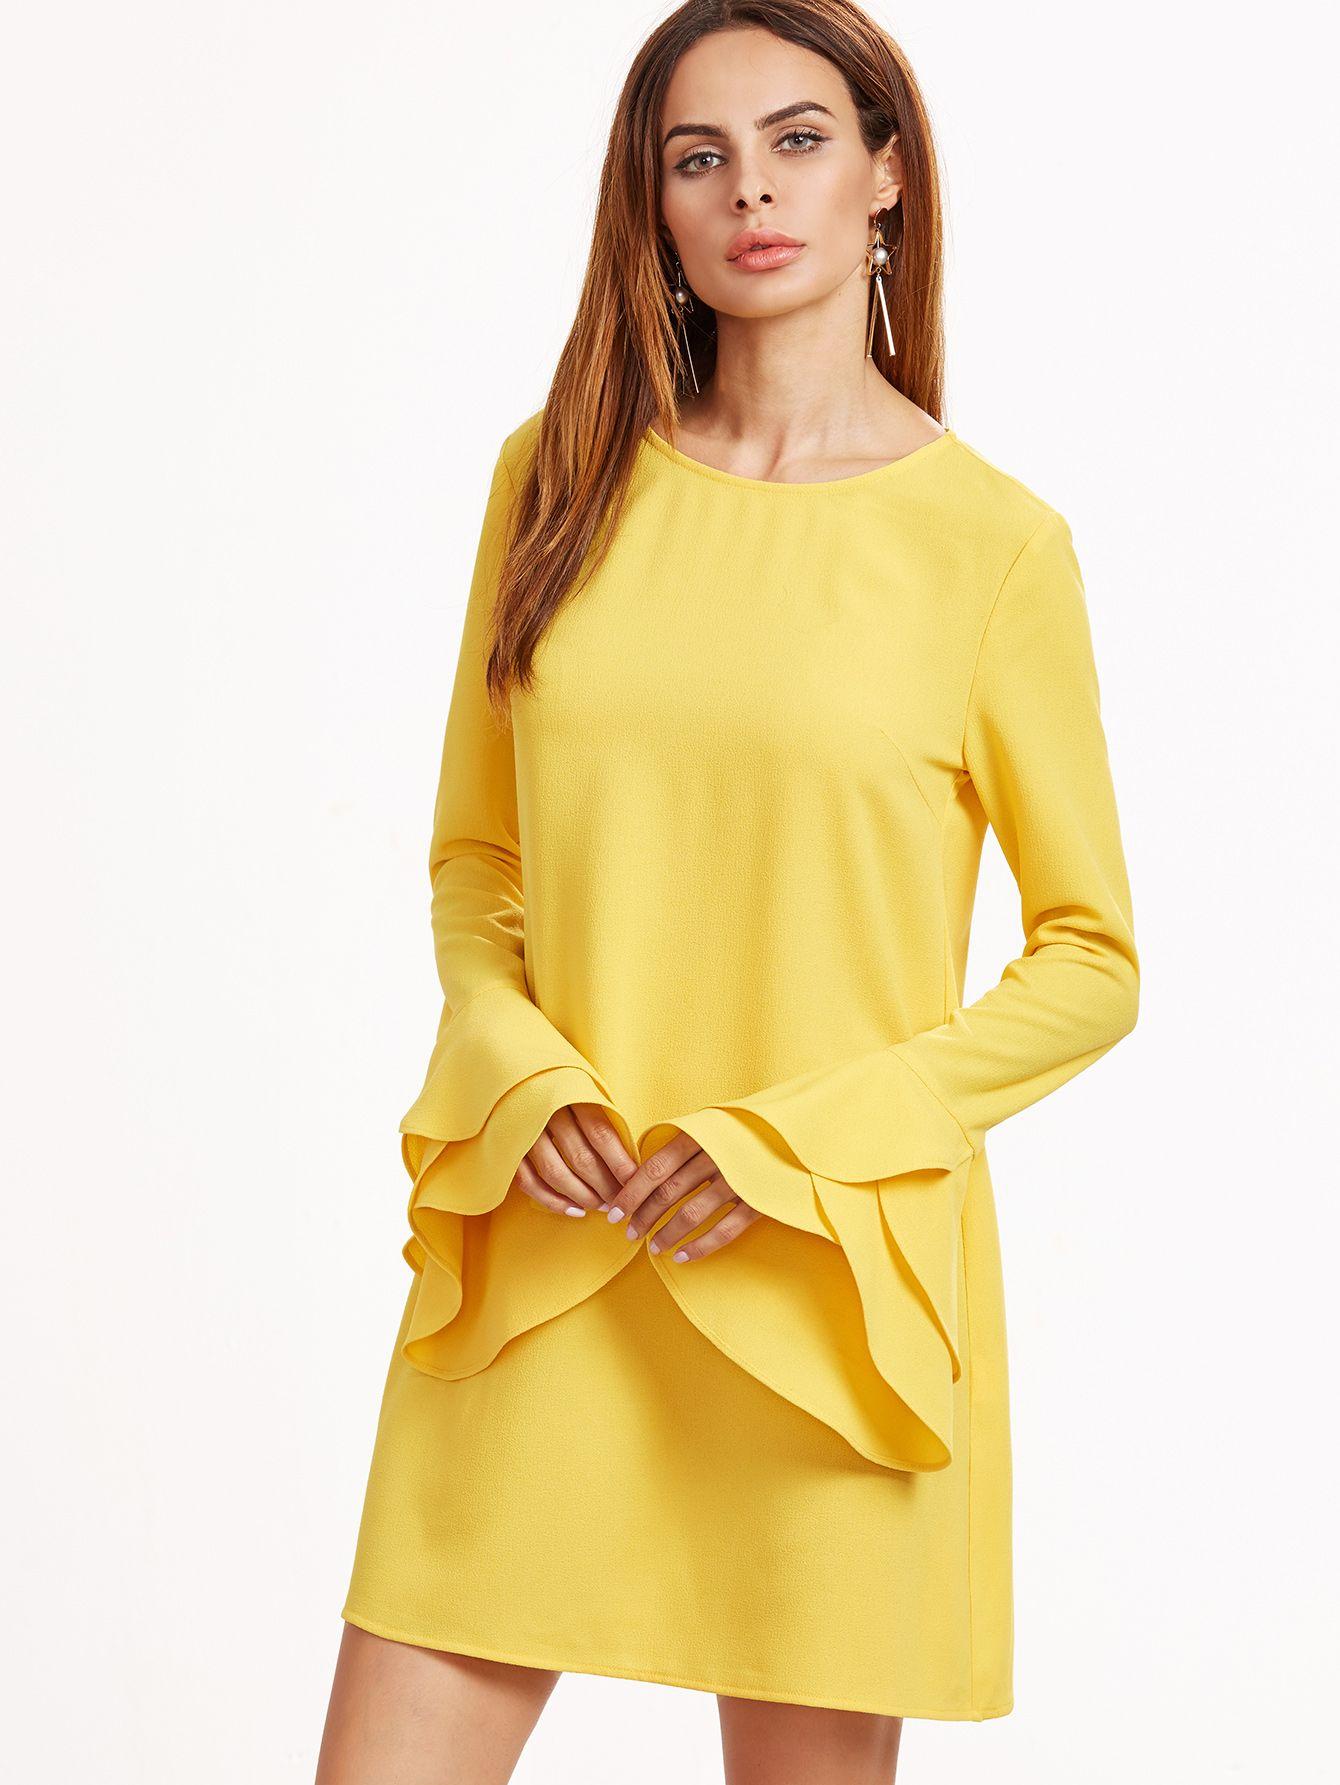 Yellow Layered Ruffle Sleeve Dress — 0.00 € ---------------------color: Yellow size: L,M,S,XS